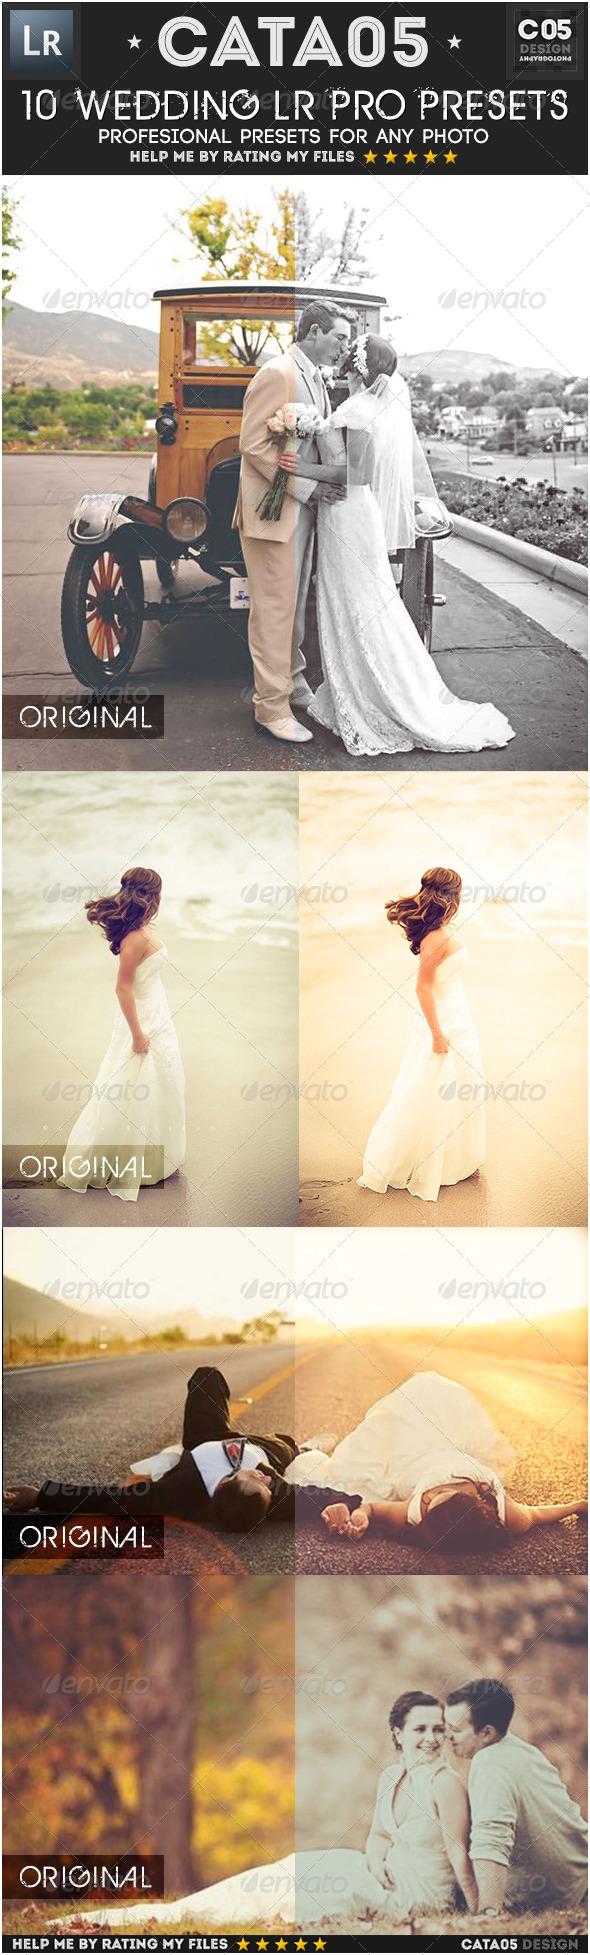 GraphicRiver 10 Wedding Pro Presets 7128951